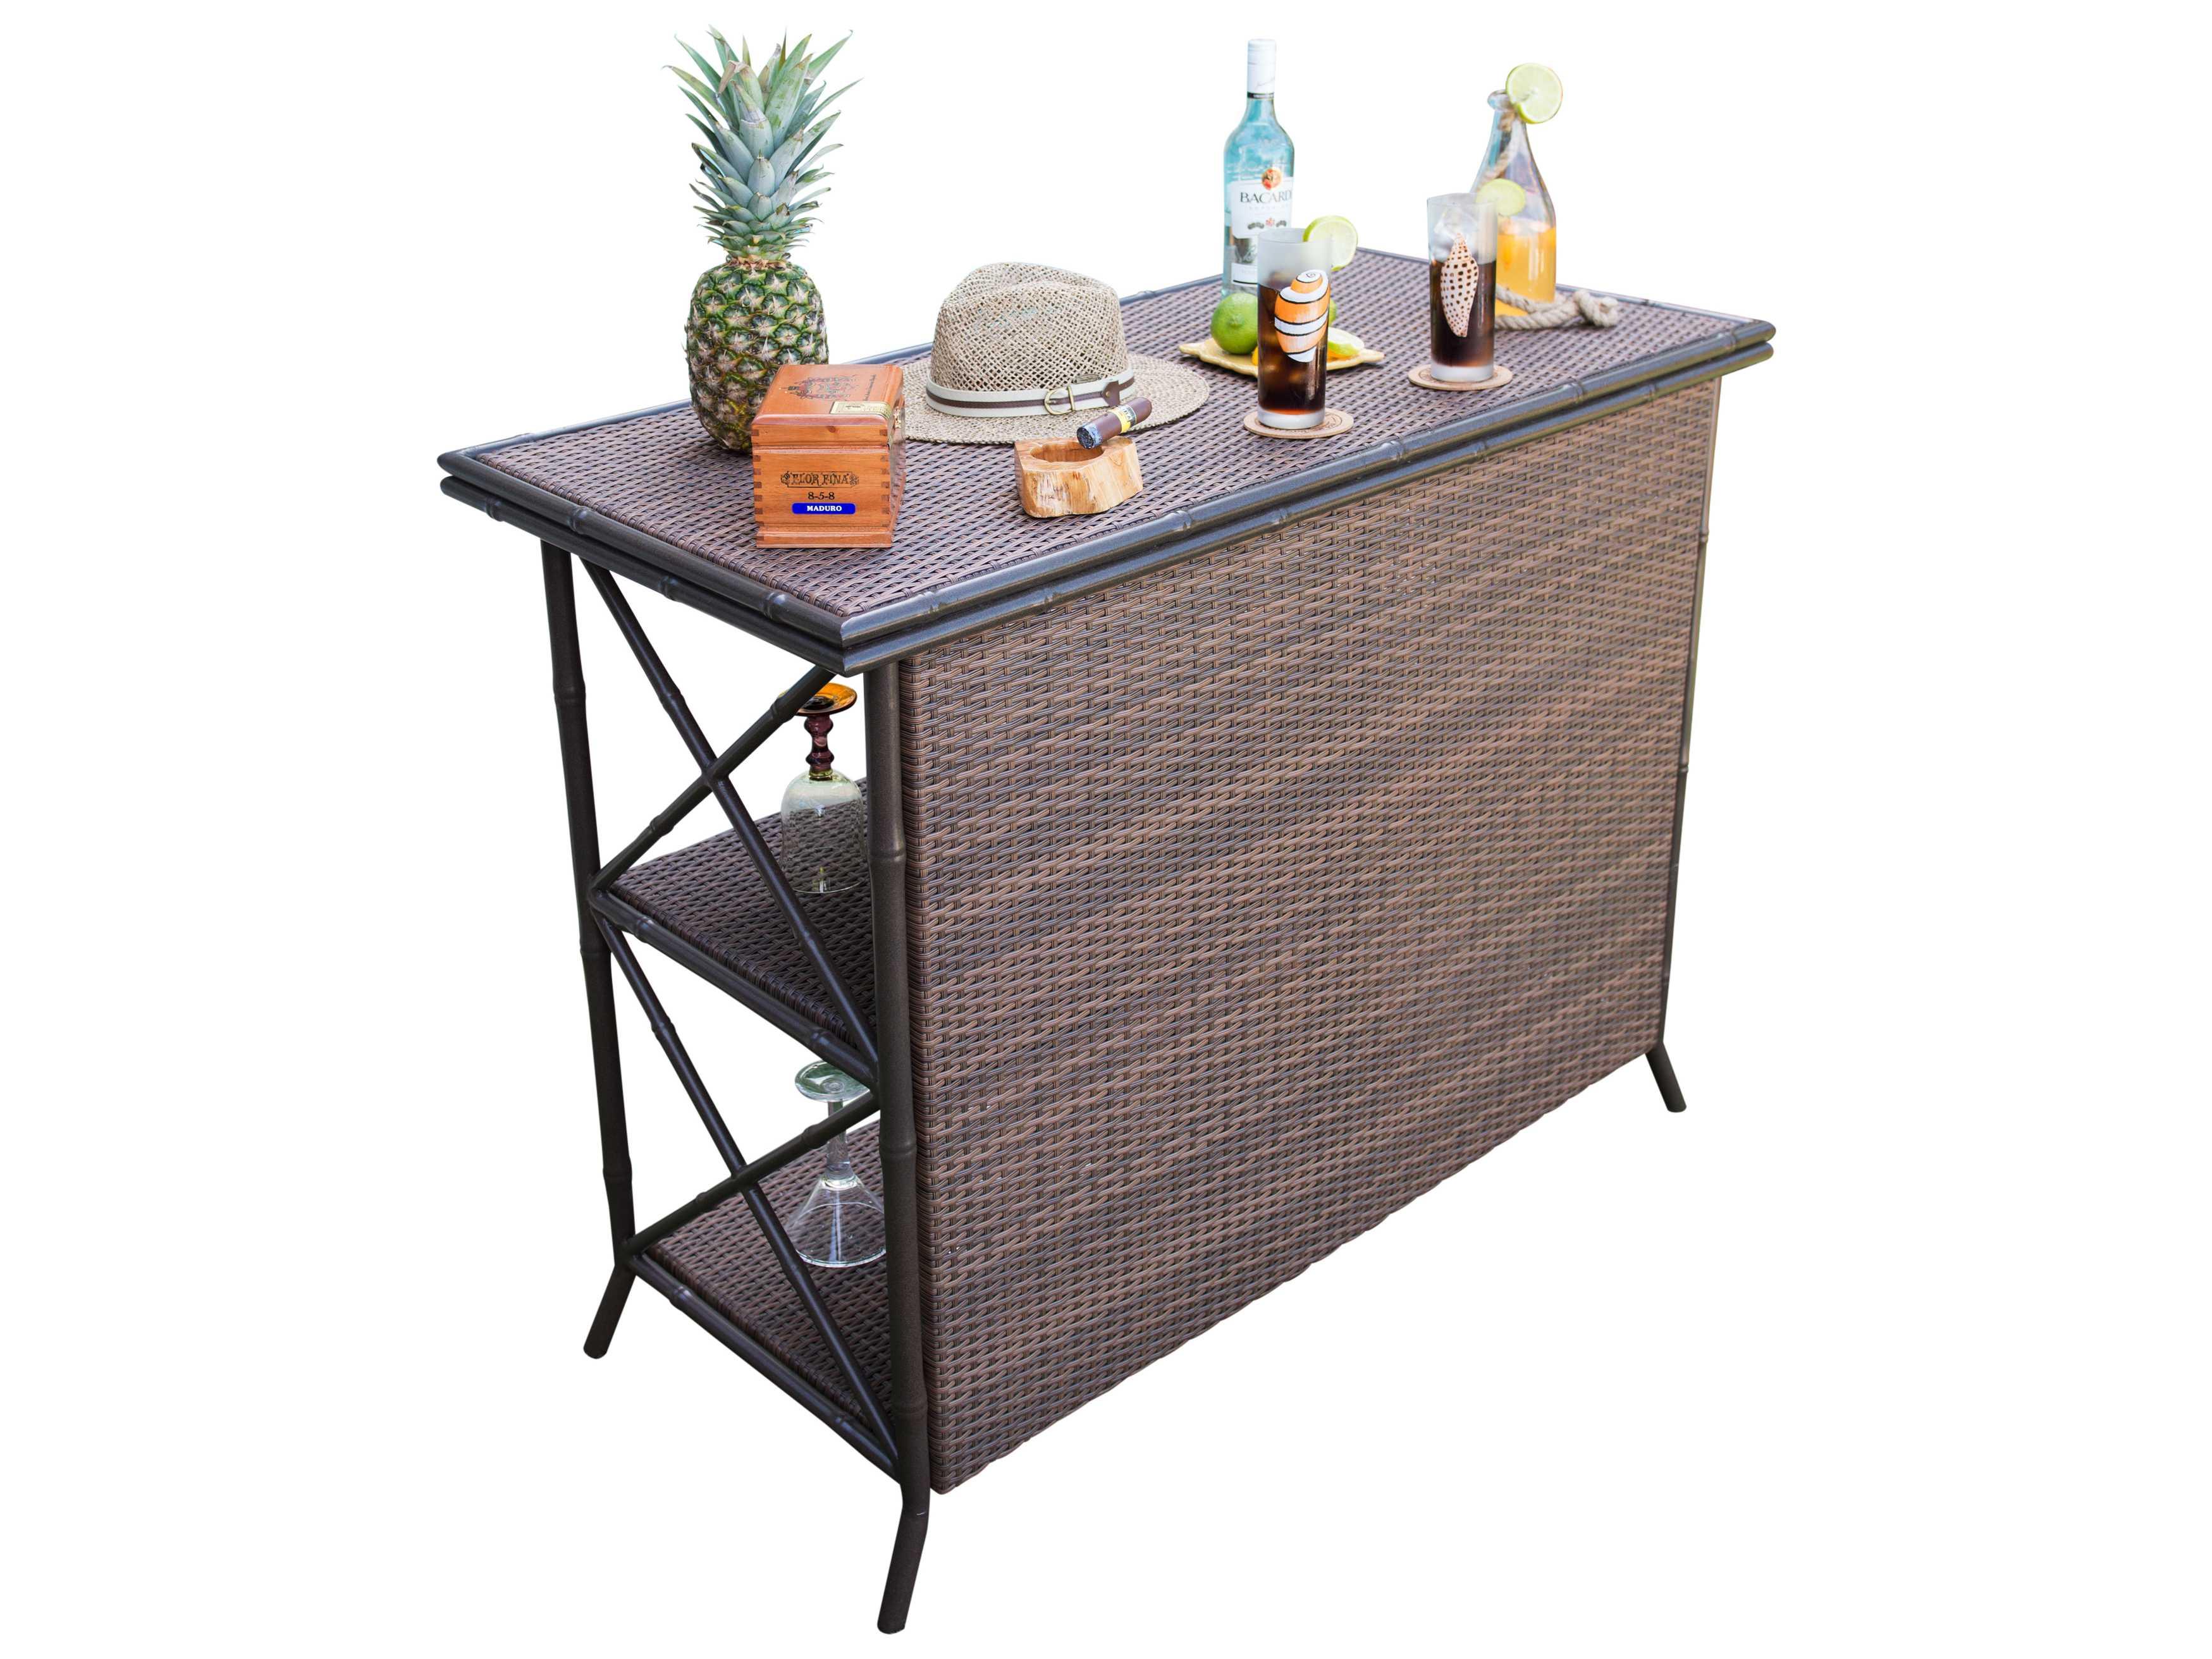 panama jack rum cay aluminum 50 x 24 rectangular bar with glass pjpjo1201atqbr. Black Bedroom Furniture Sets. Home Design Ideas